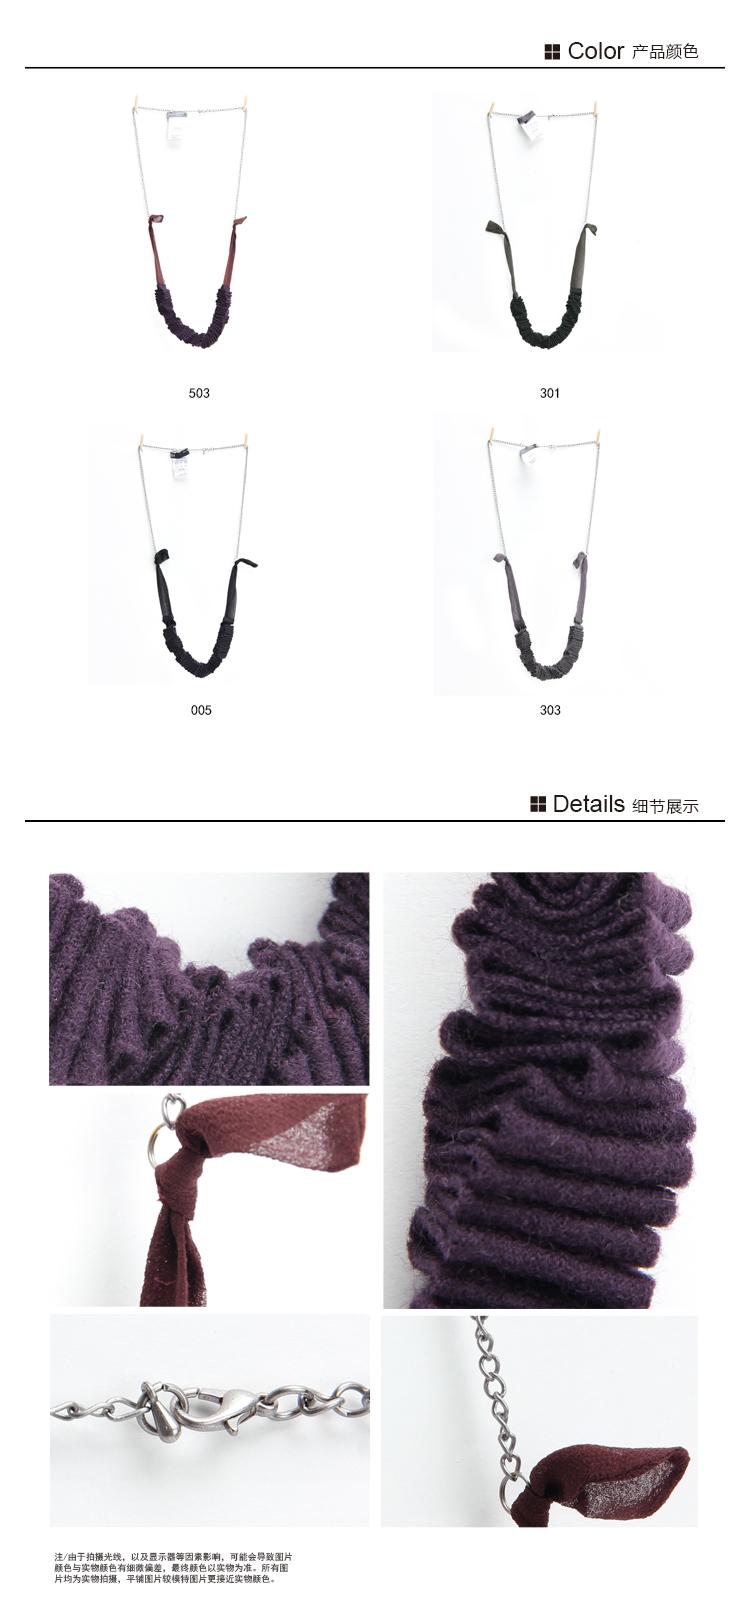 jnby/江南布衣原创设计时尚百搭配饰针织项链7e66199